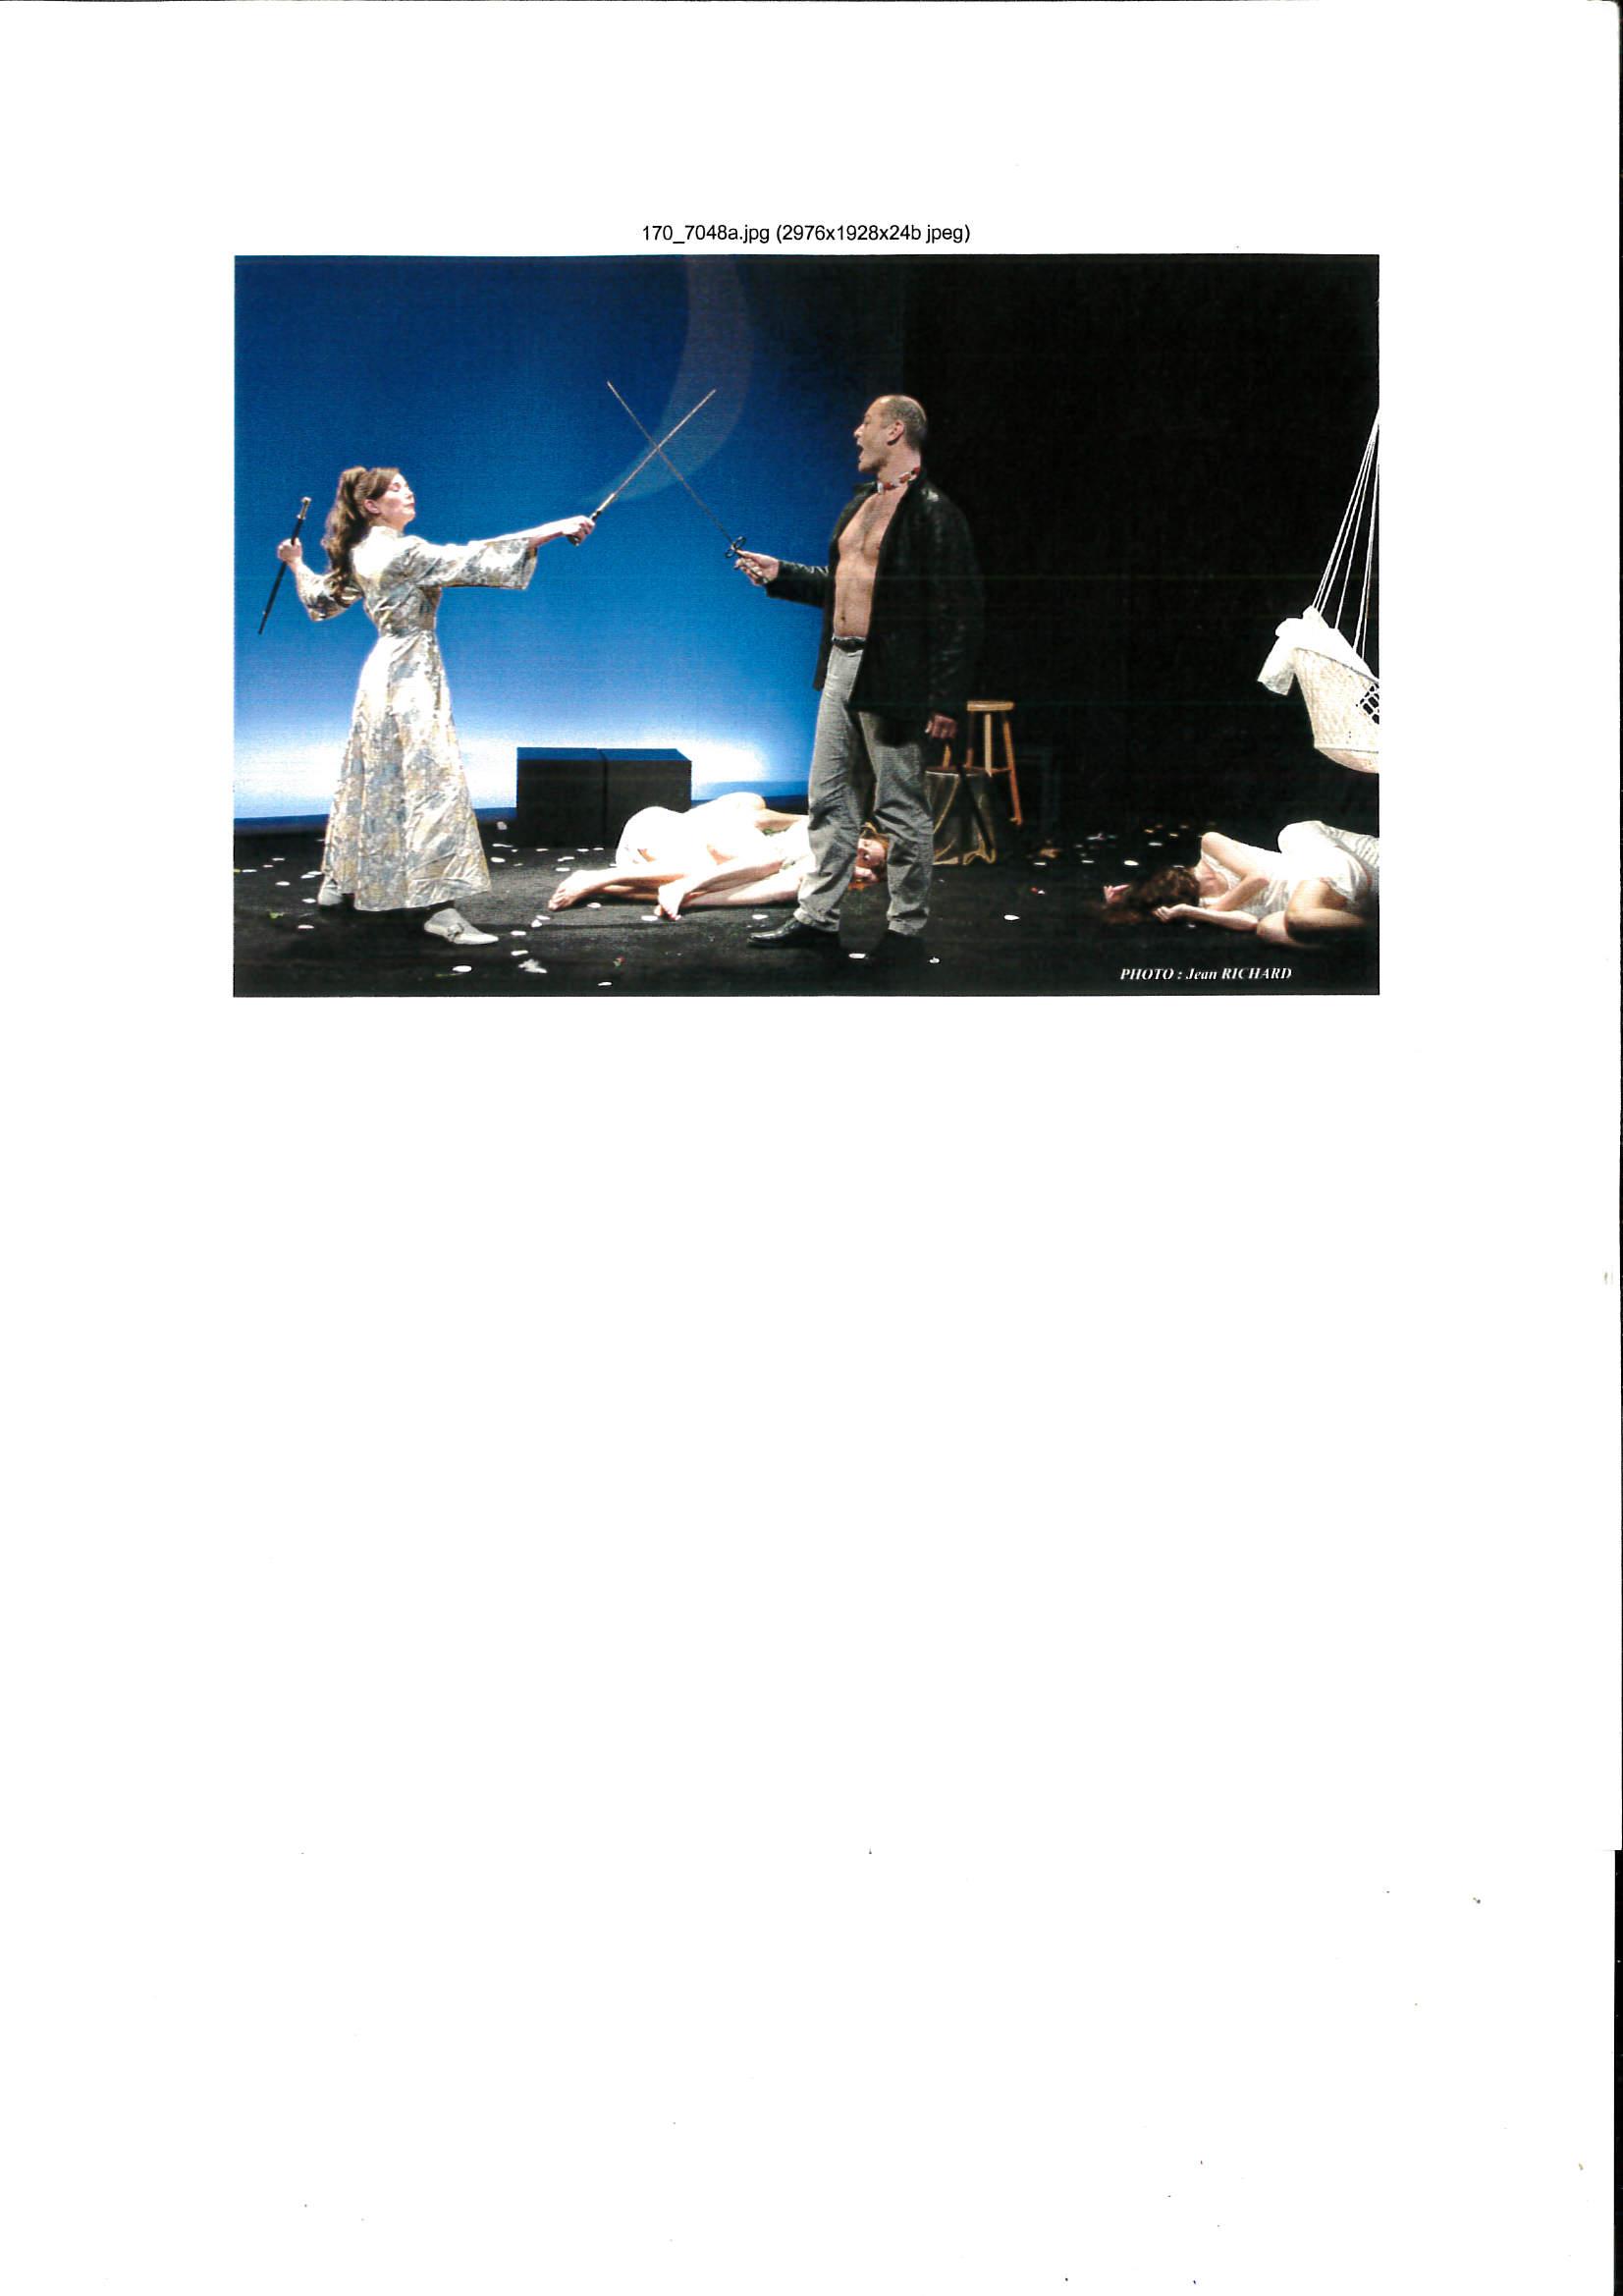 owap production CREATION AND DIRECTION KIM MICHELLE BRODERICK for 2nd year OWAP at Comédie Française PARIS PYRAMIDE DU louvre .jpg